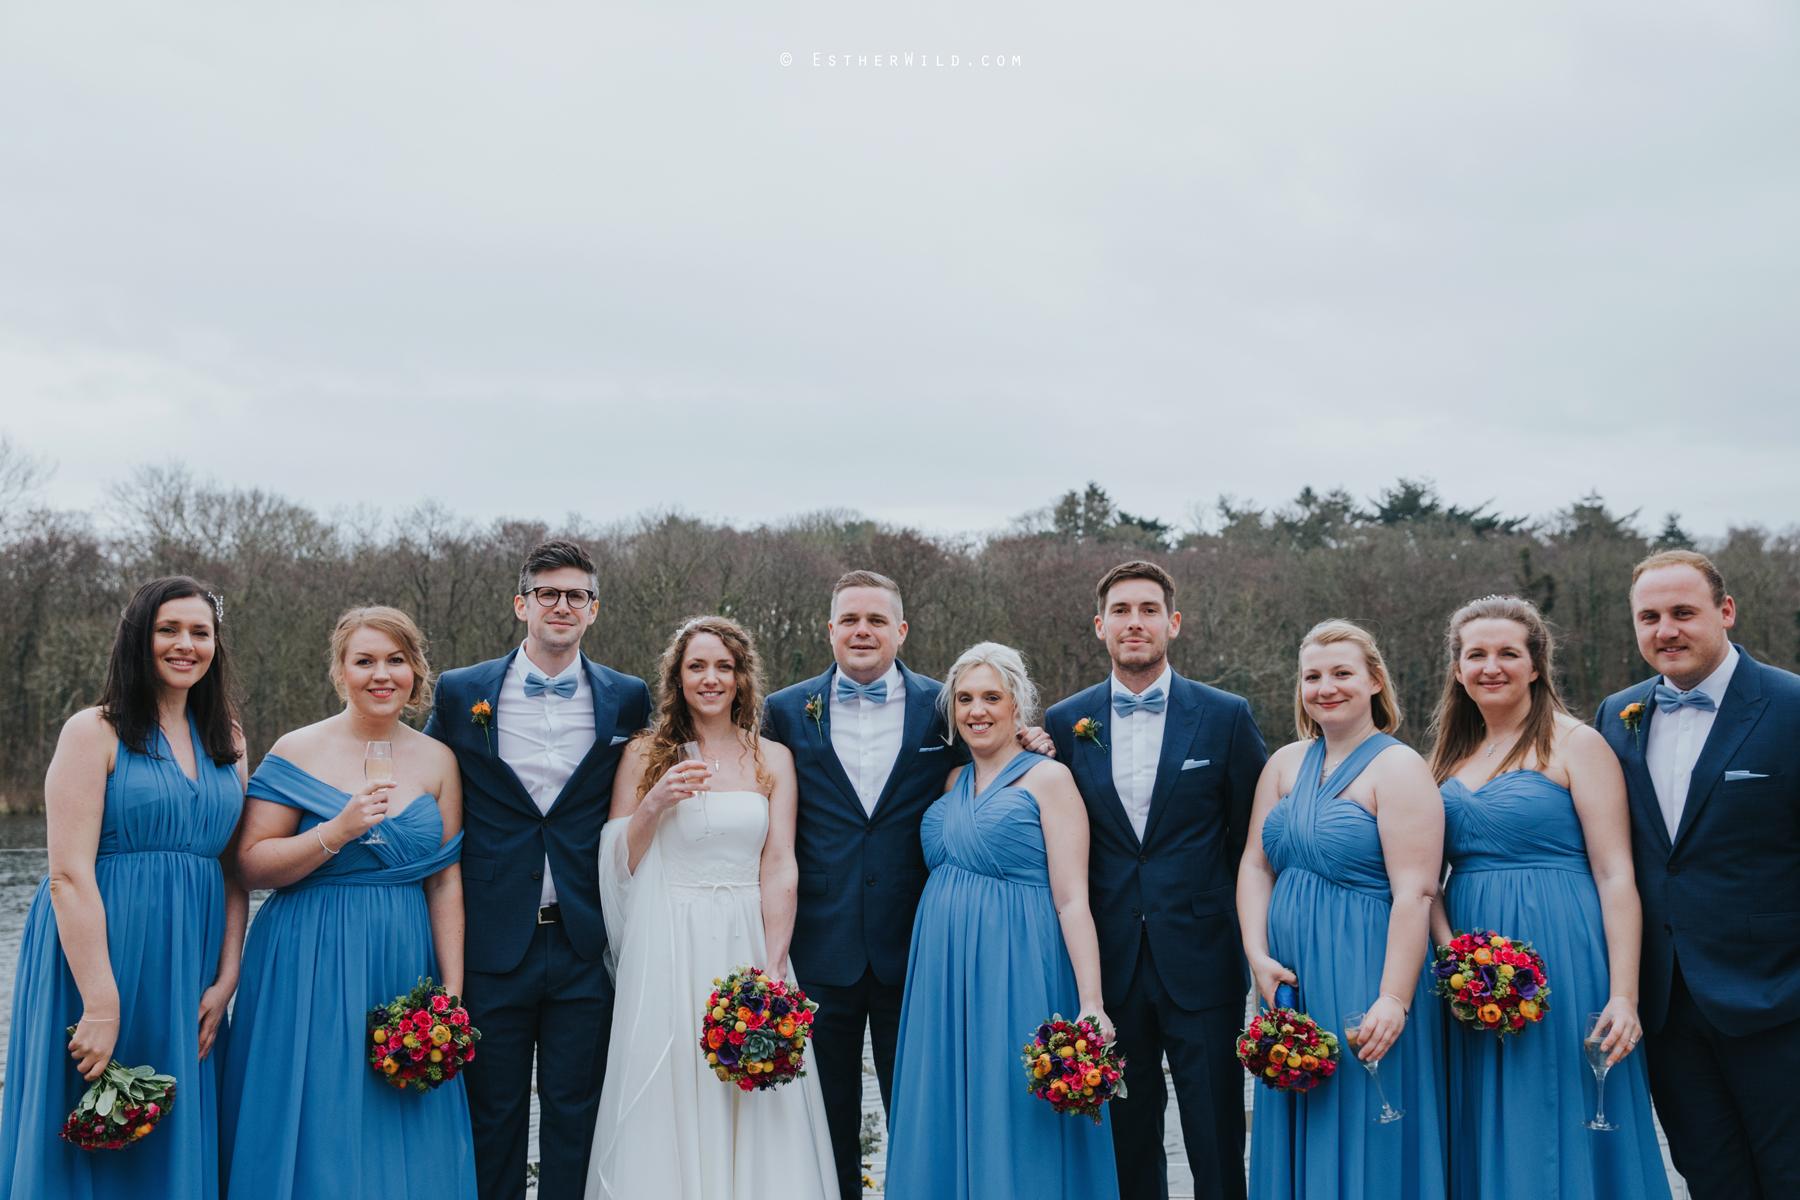 The_BoatHouse_Wedding_Venue_Ormesby_Norfolk_Broads_Boat_Wedding_Photography_Esther_Wild_Photographer_IMG_2006.jpg